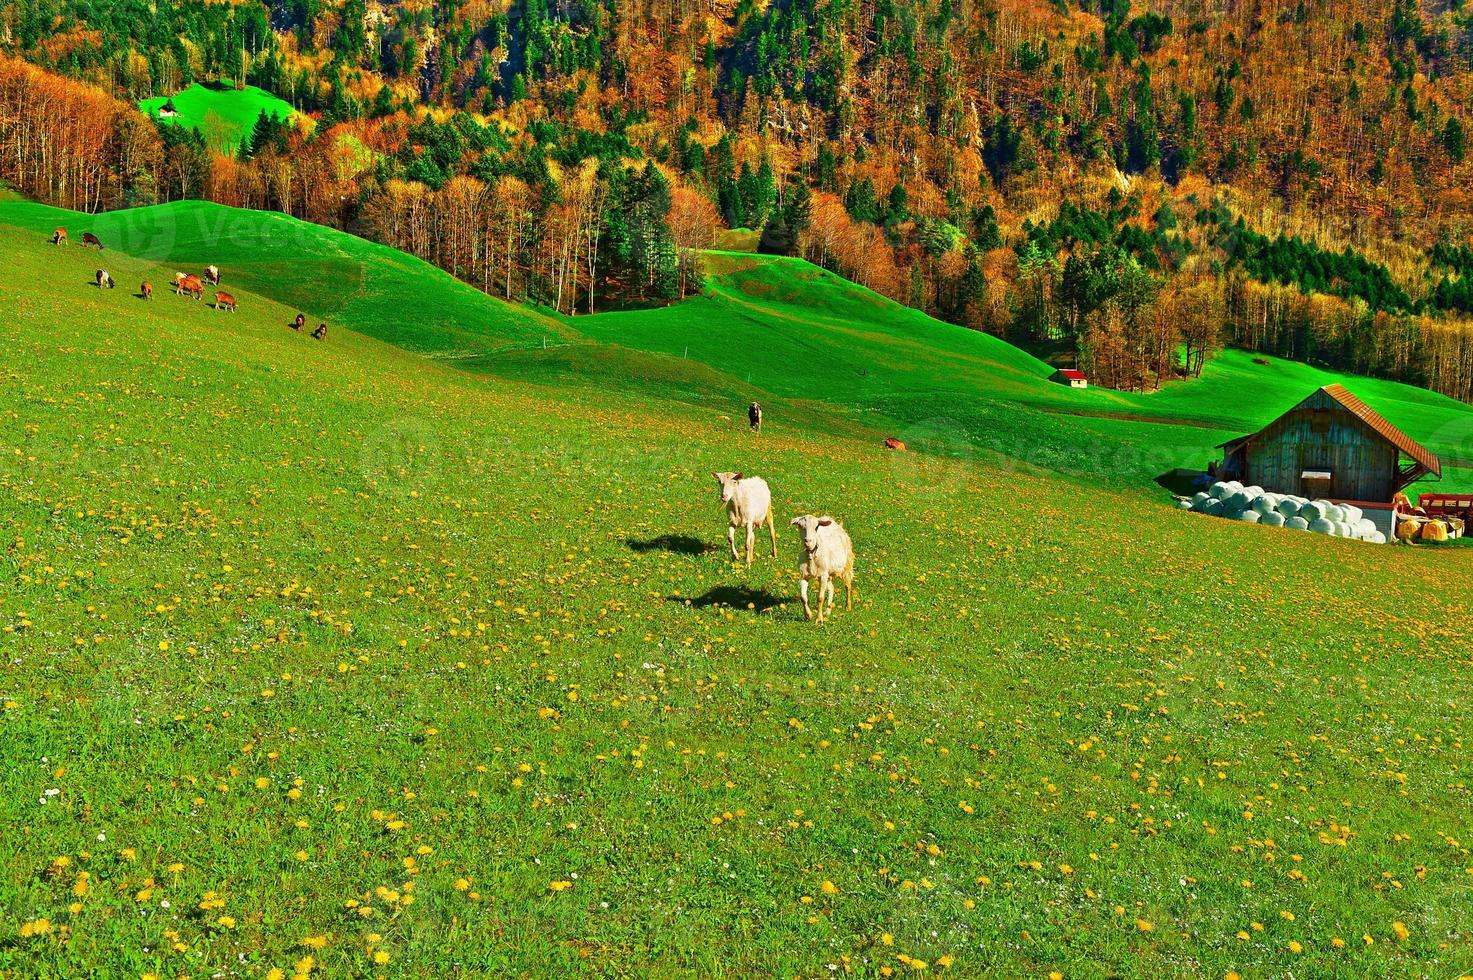 chèvres photo